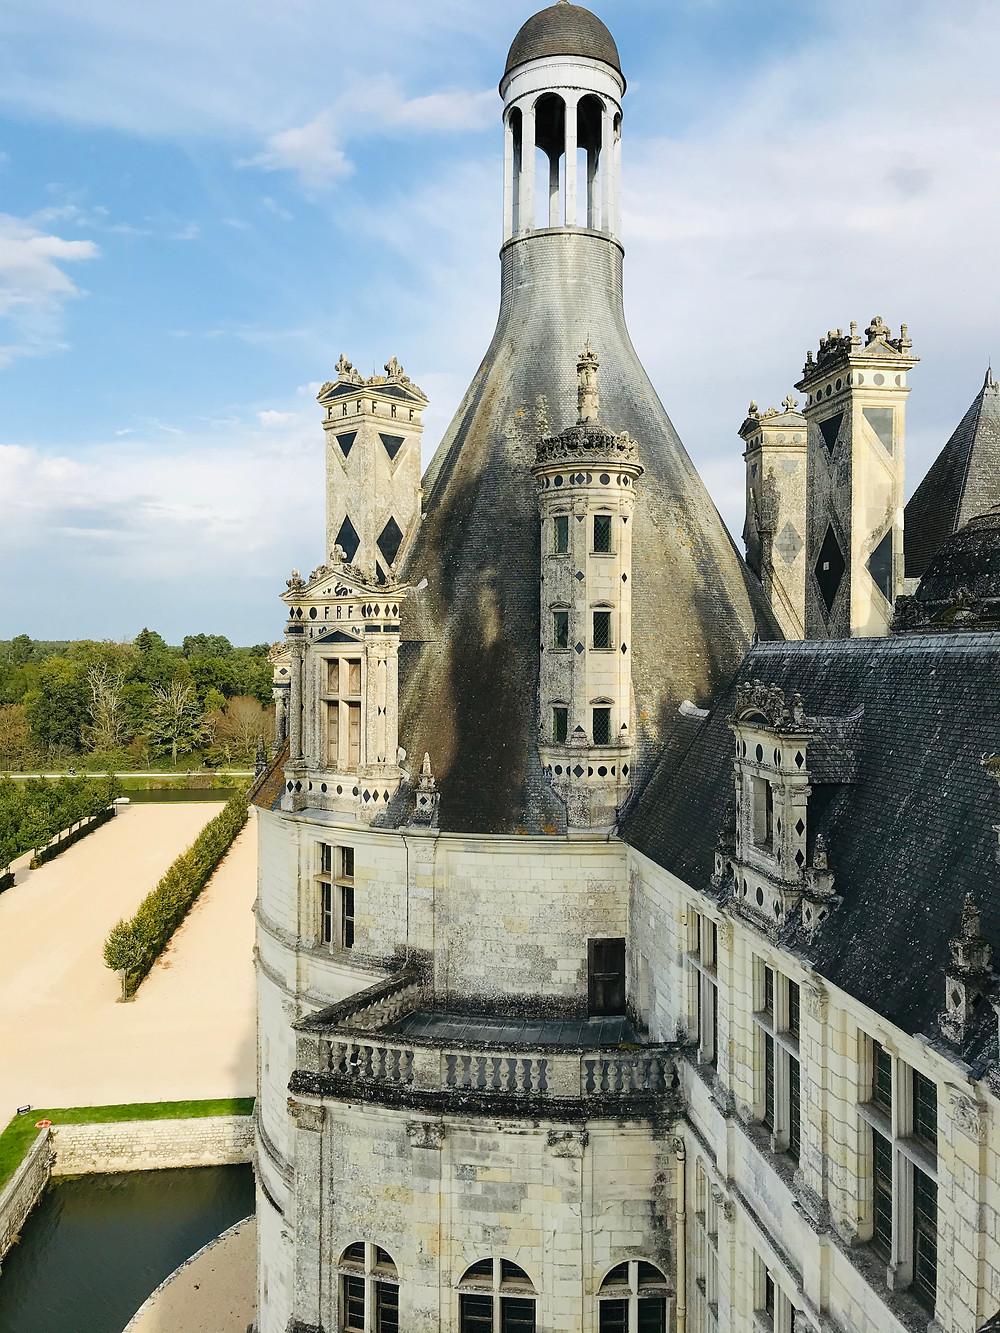 chateau-de-chambord-rooftop-view